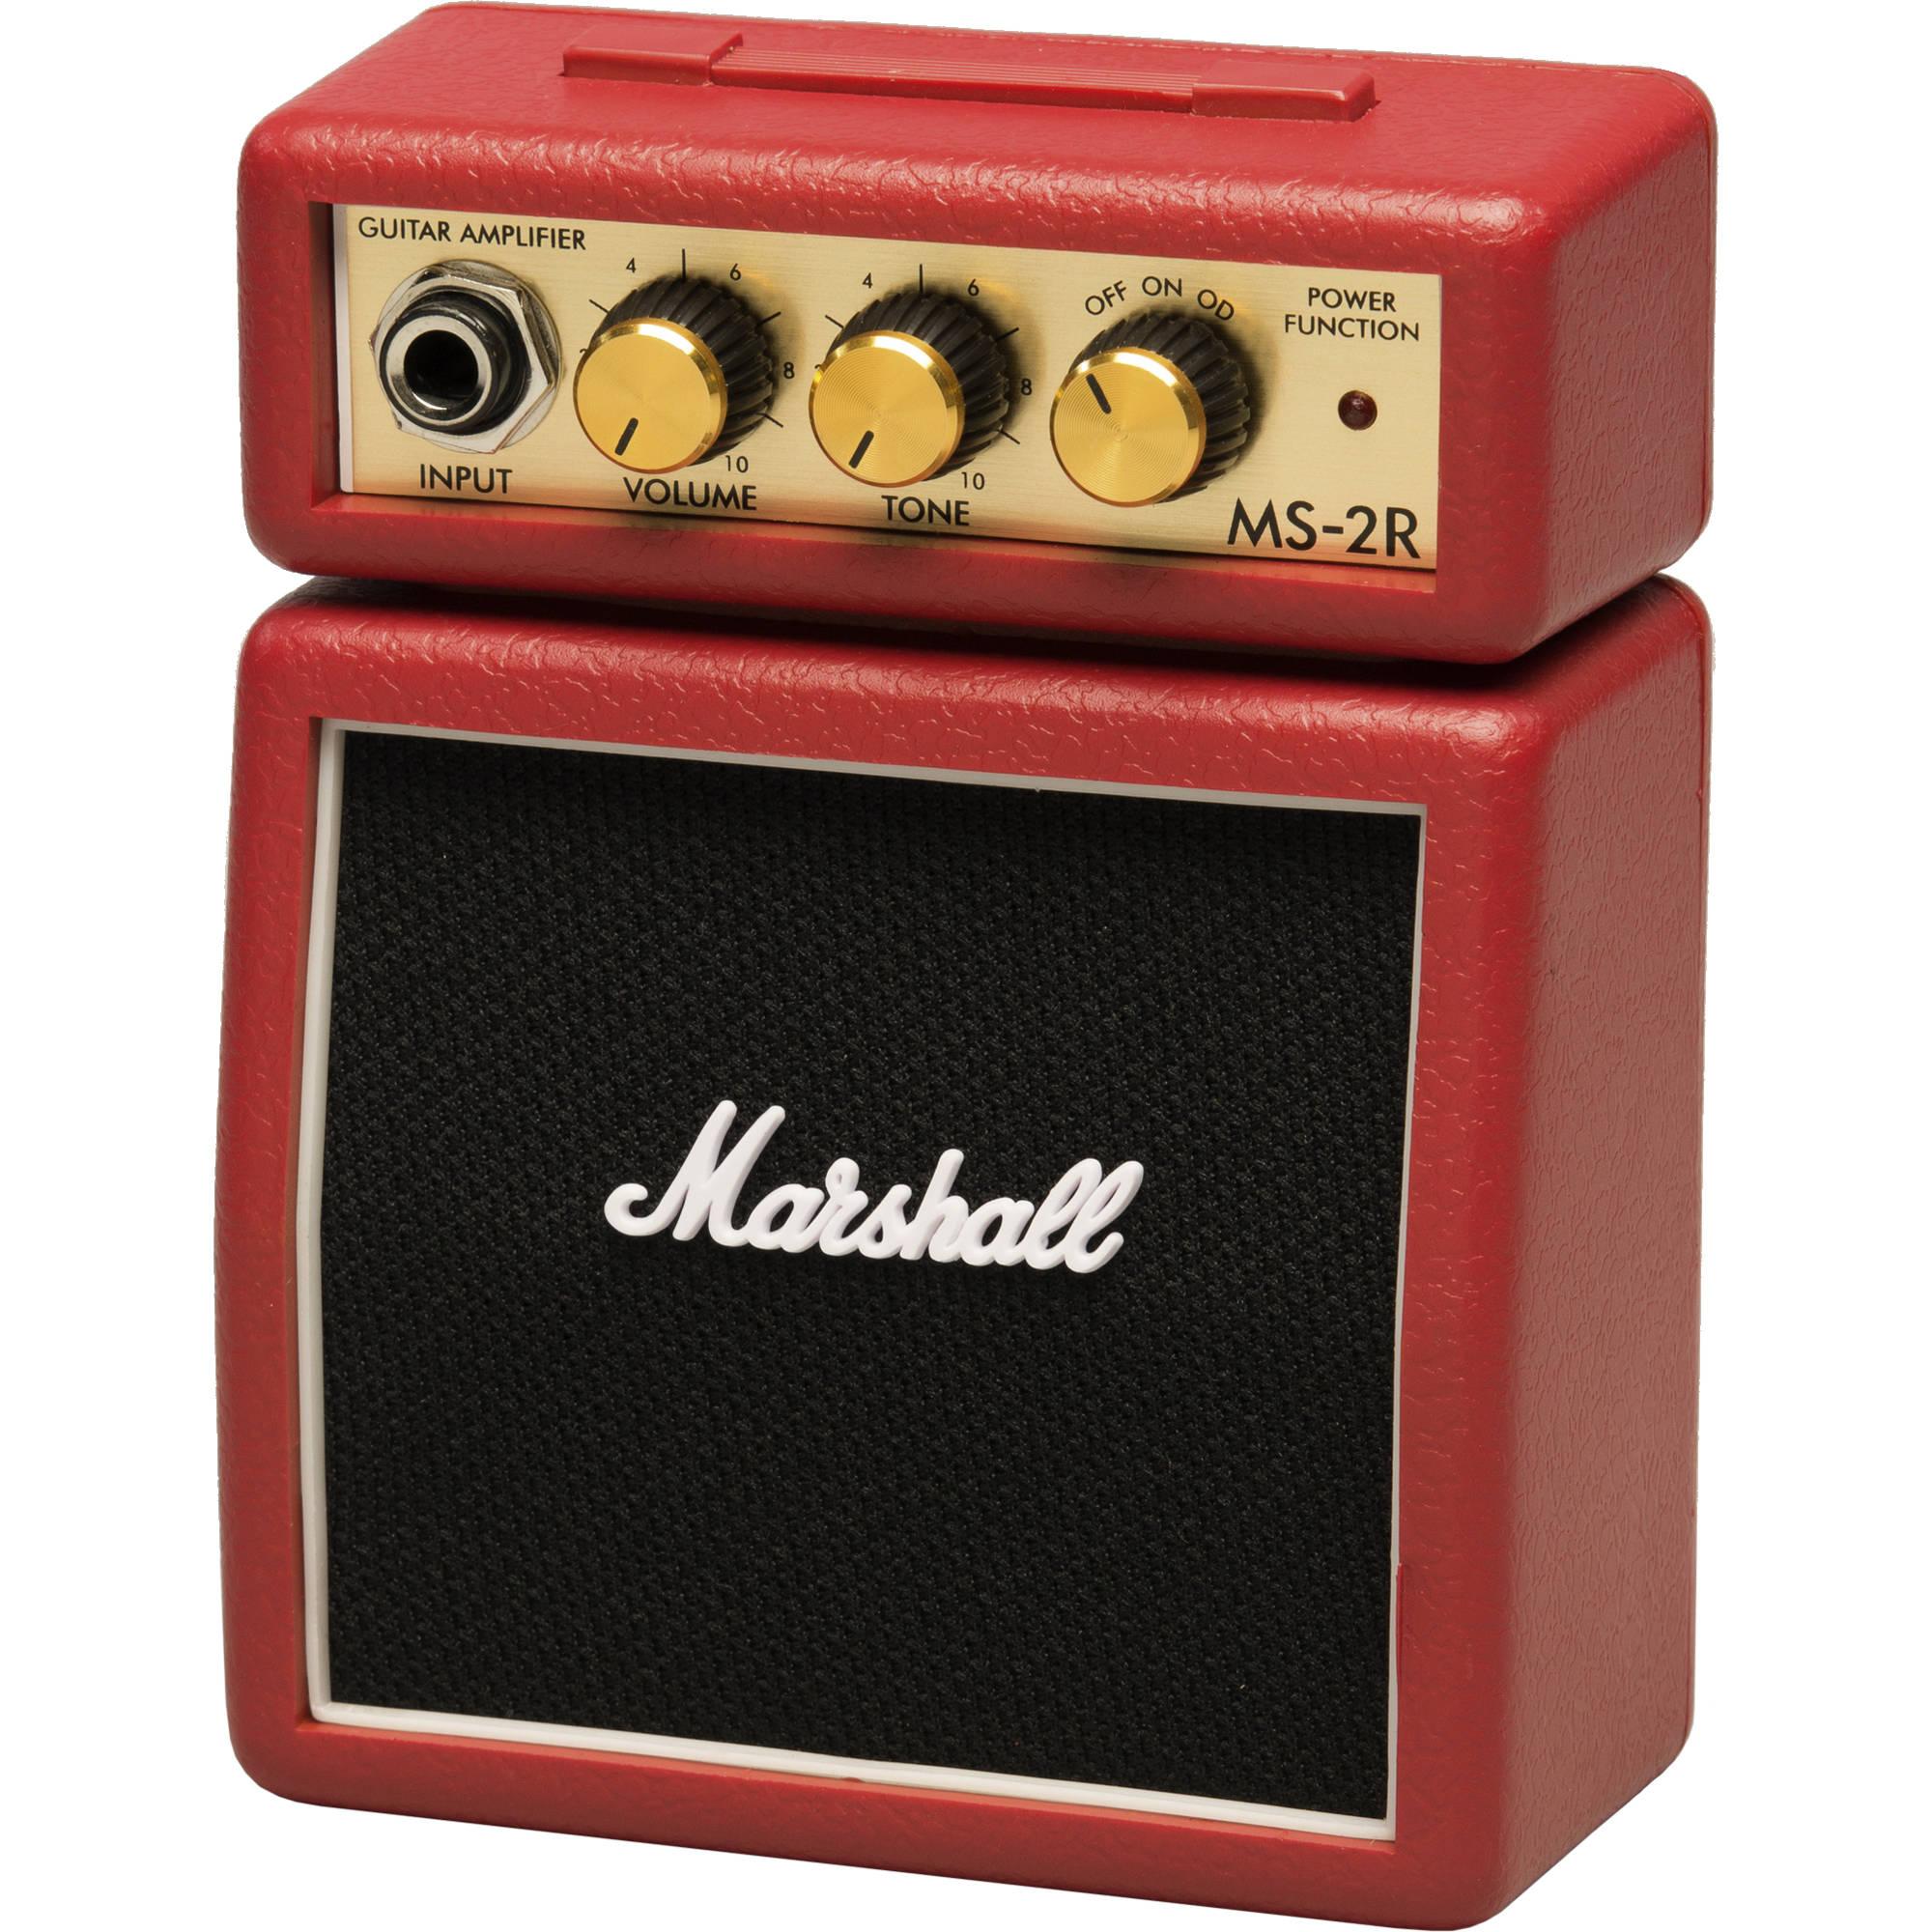 marshall amplification ms 2r micro amp mini practice amp ms 2r rh bhphotovideo com Small Amplifier Micro Audio Amplifier Circuit